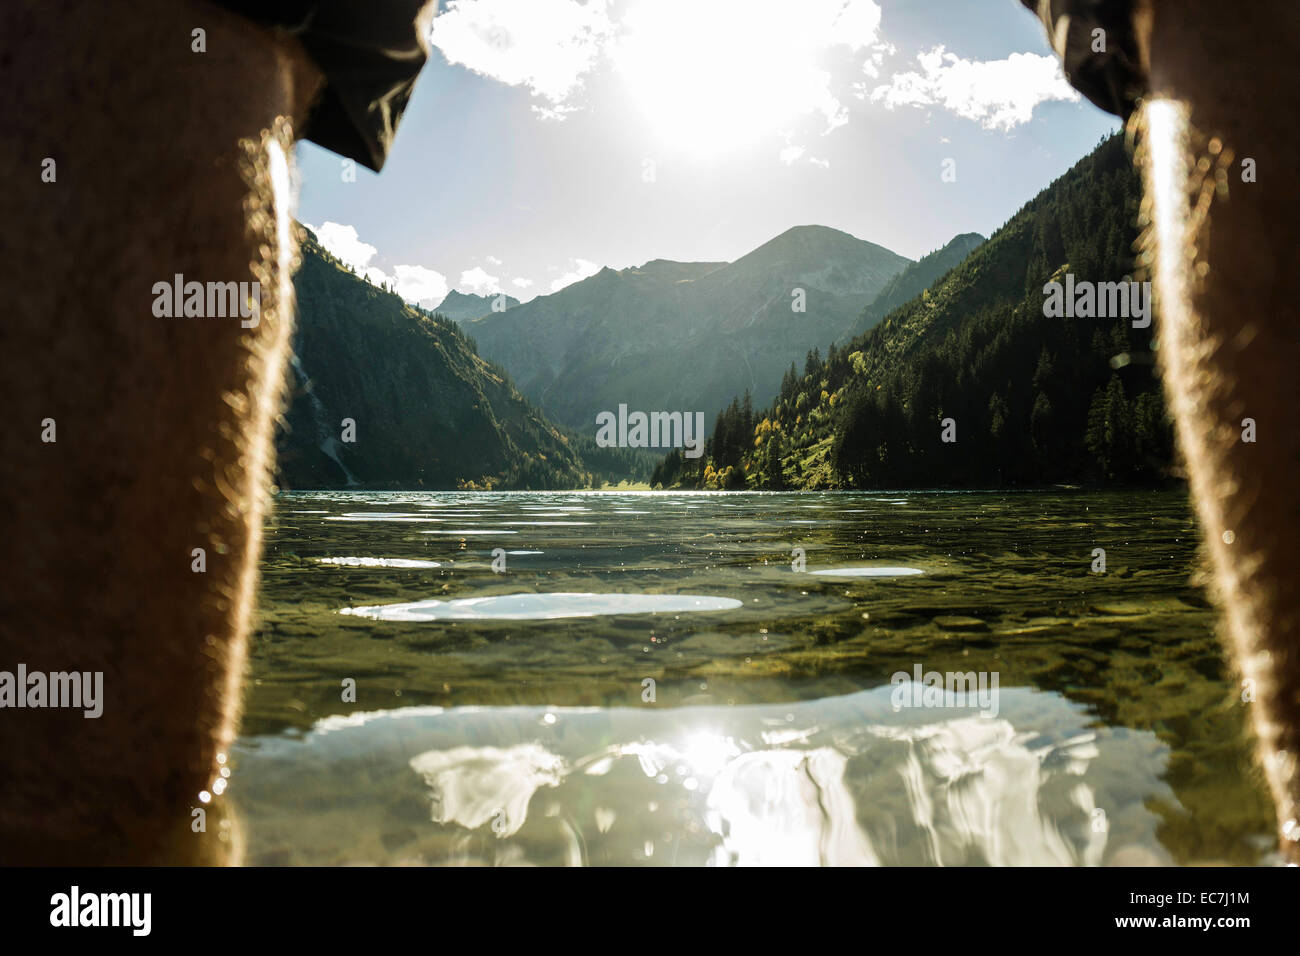 Austria, Tyrol, Tannheimer Tal, legs of a man at lakeshore - Stock Image